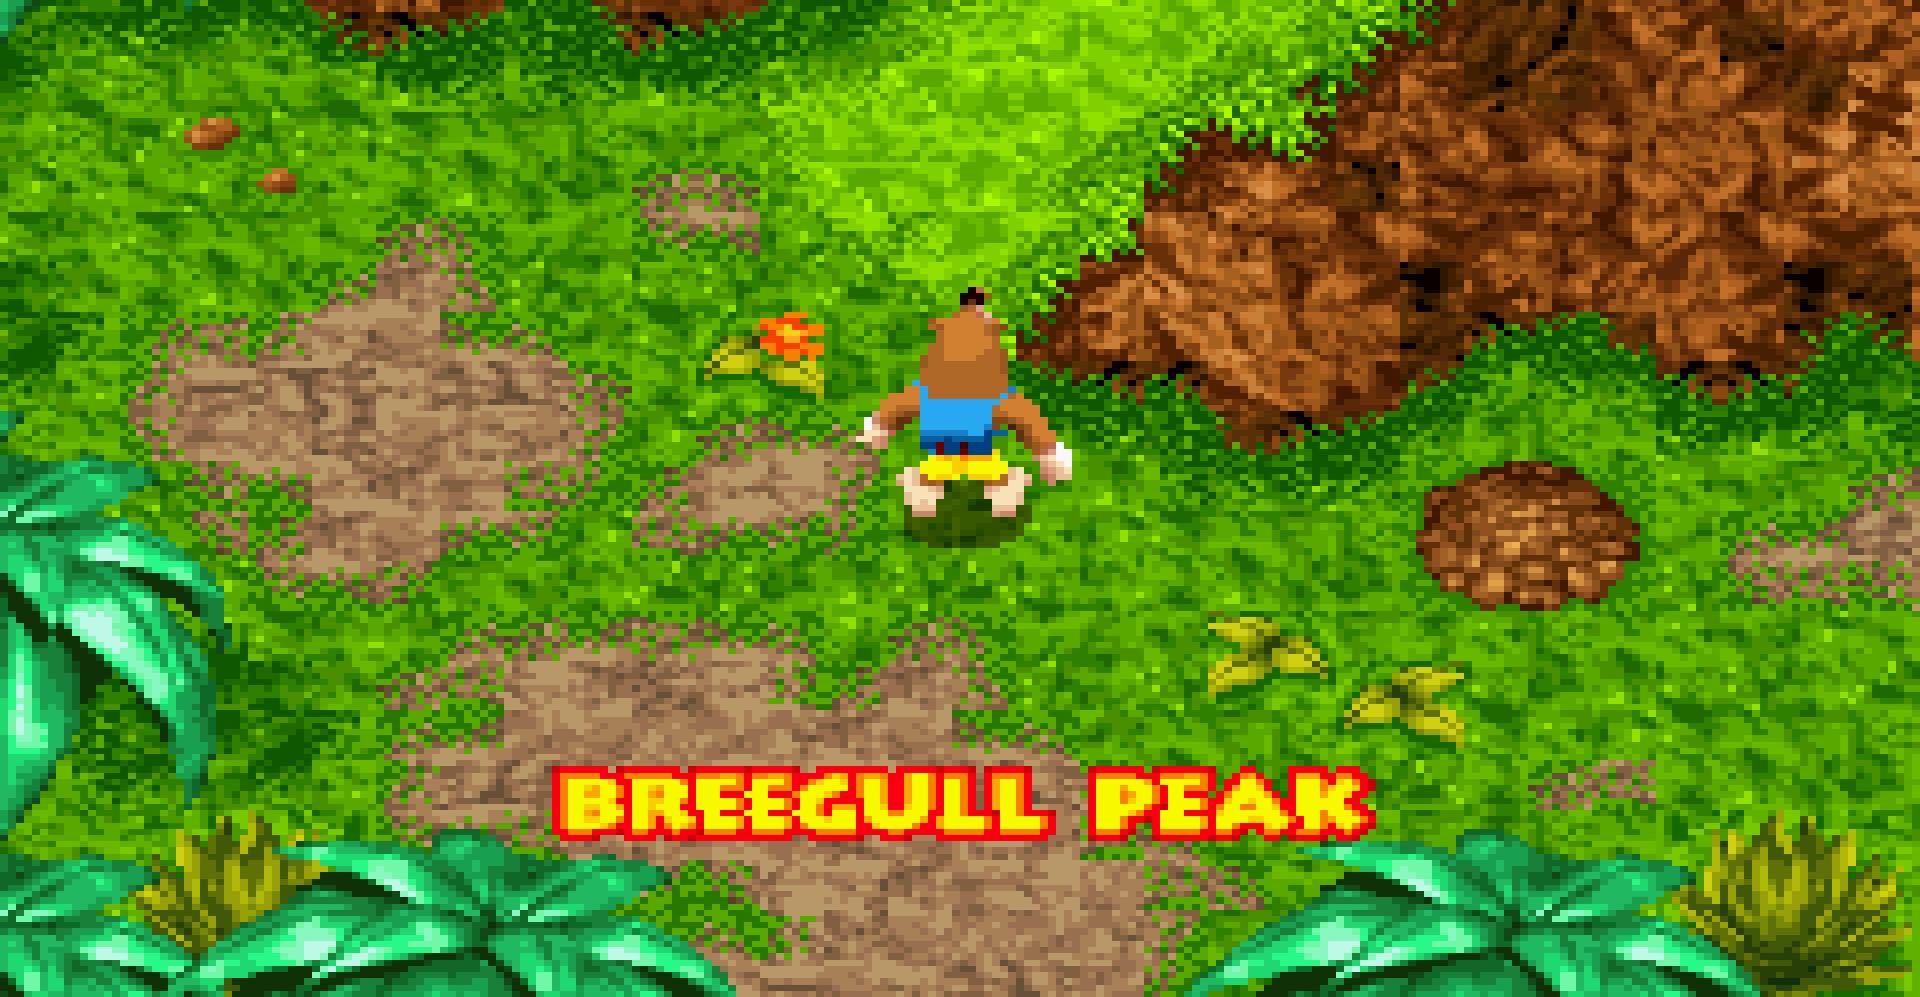 Breegull Peak